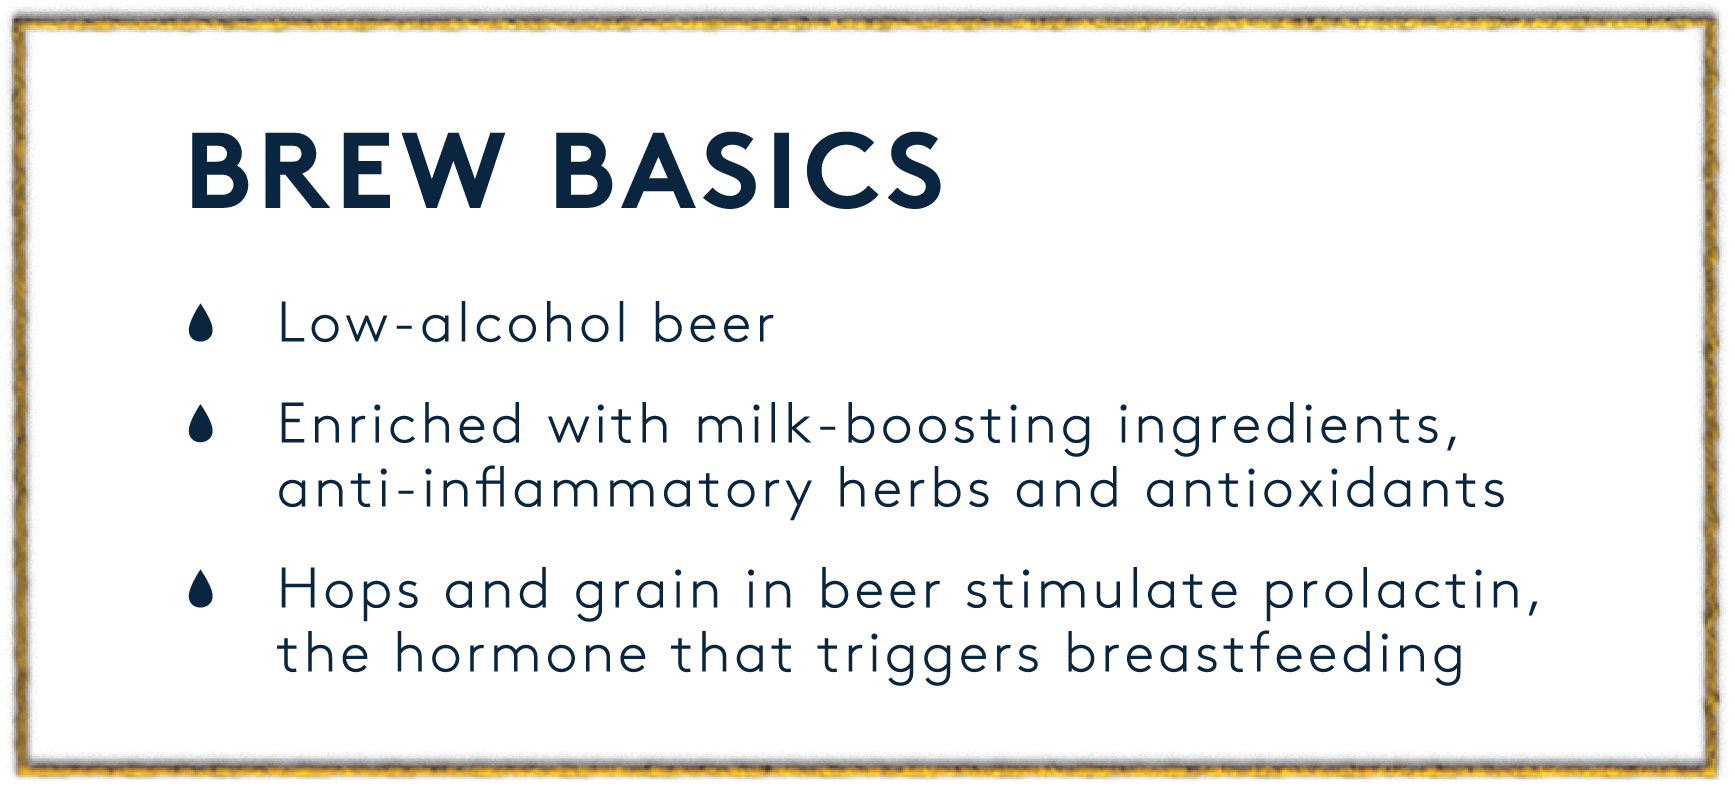 Brew Basics